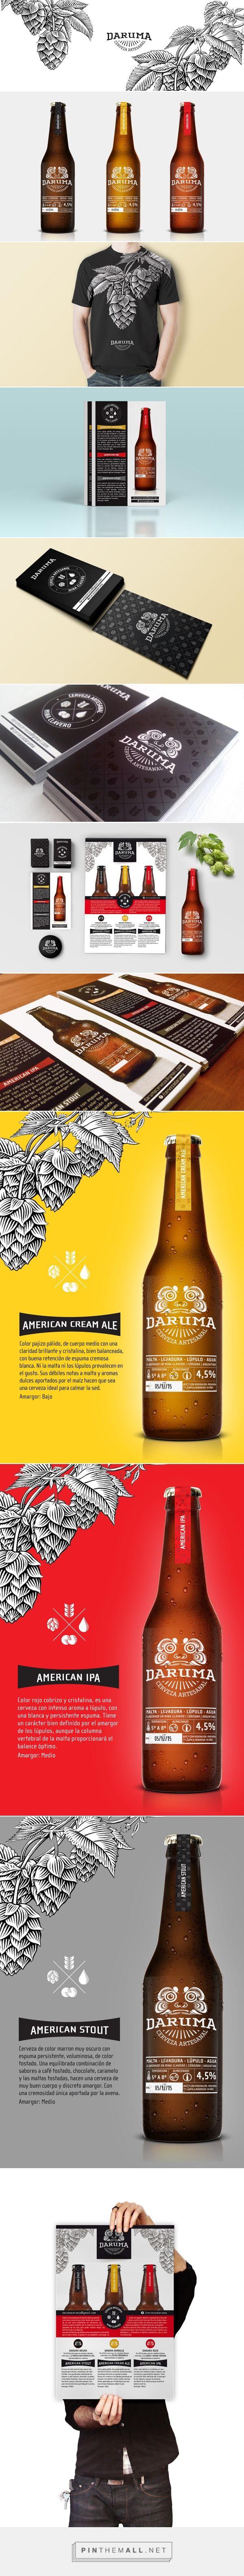 Daruma   Cerveza Artesanal by Virginia Scardino